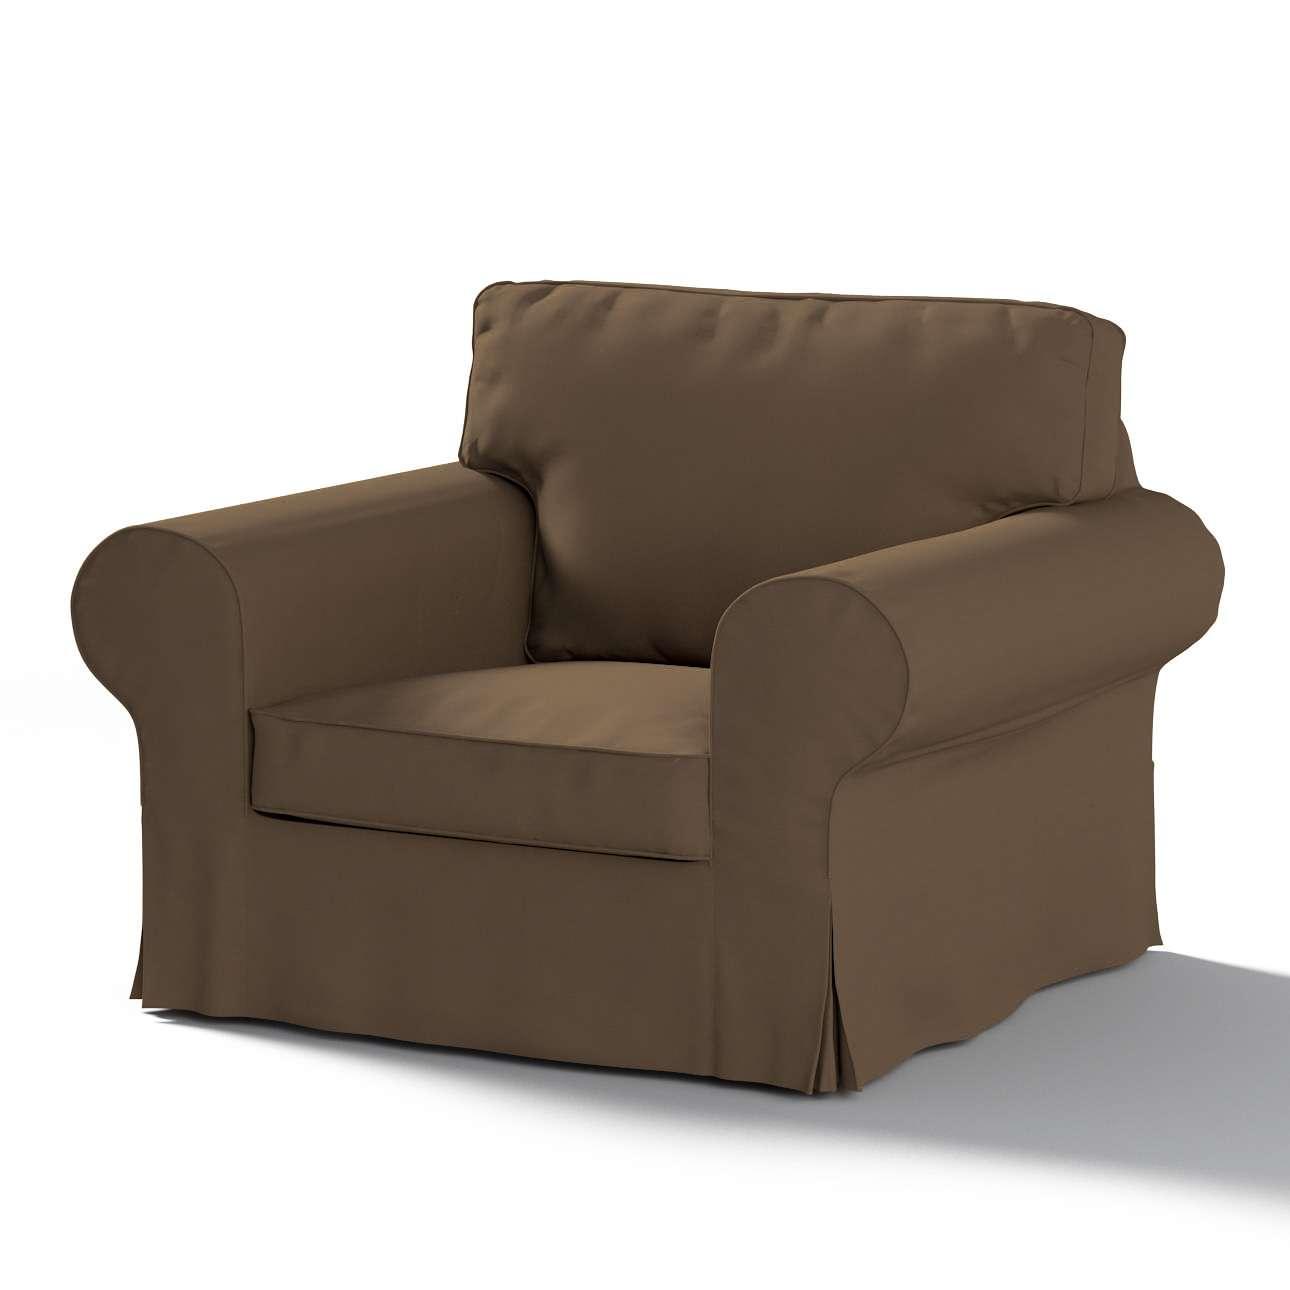 Ektorp Sesselbezug von der Kollektion Cotton Panama, Stoff: 702-02